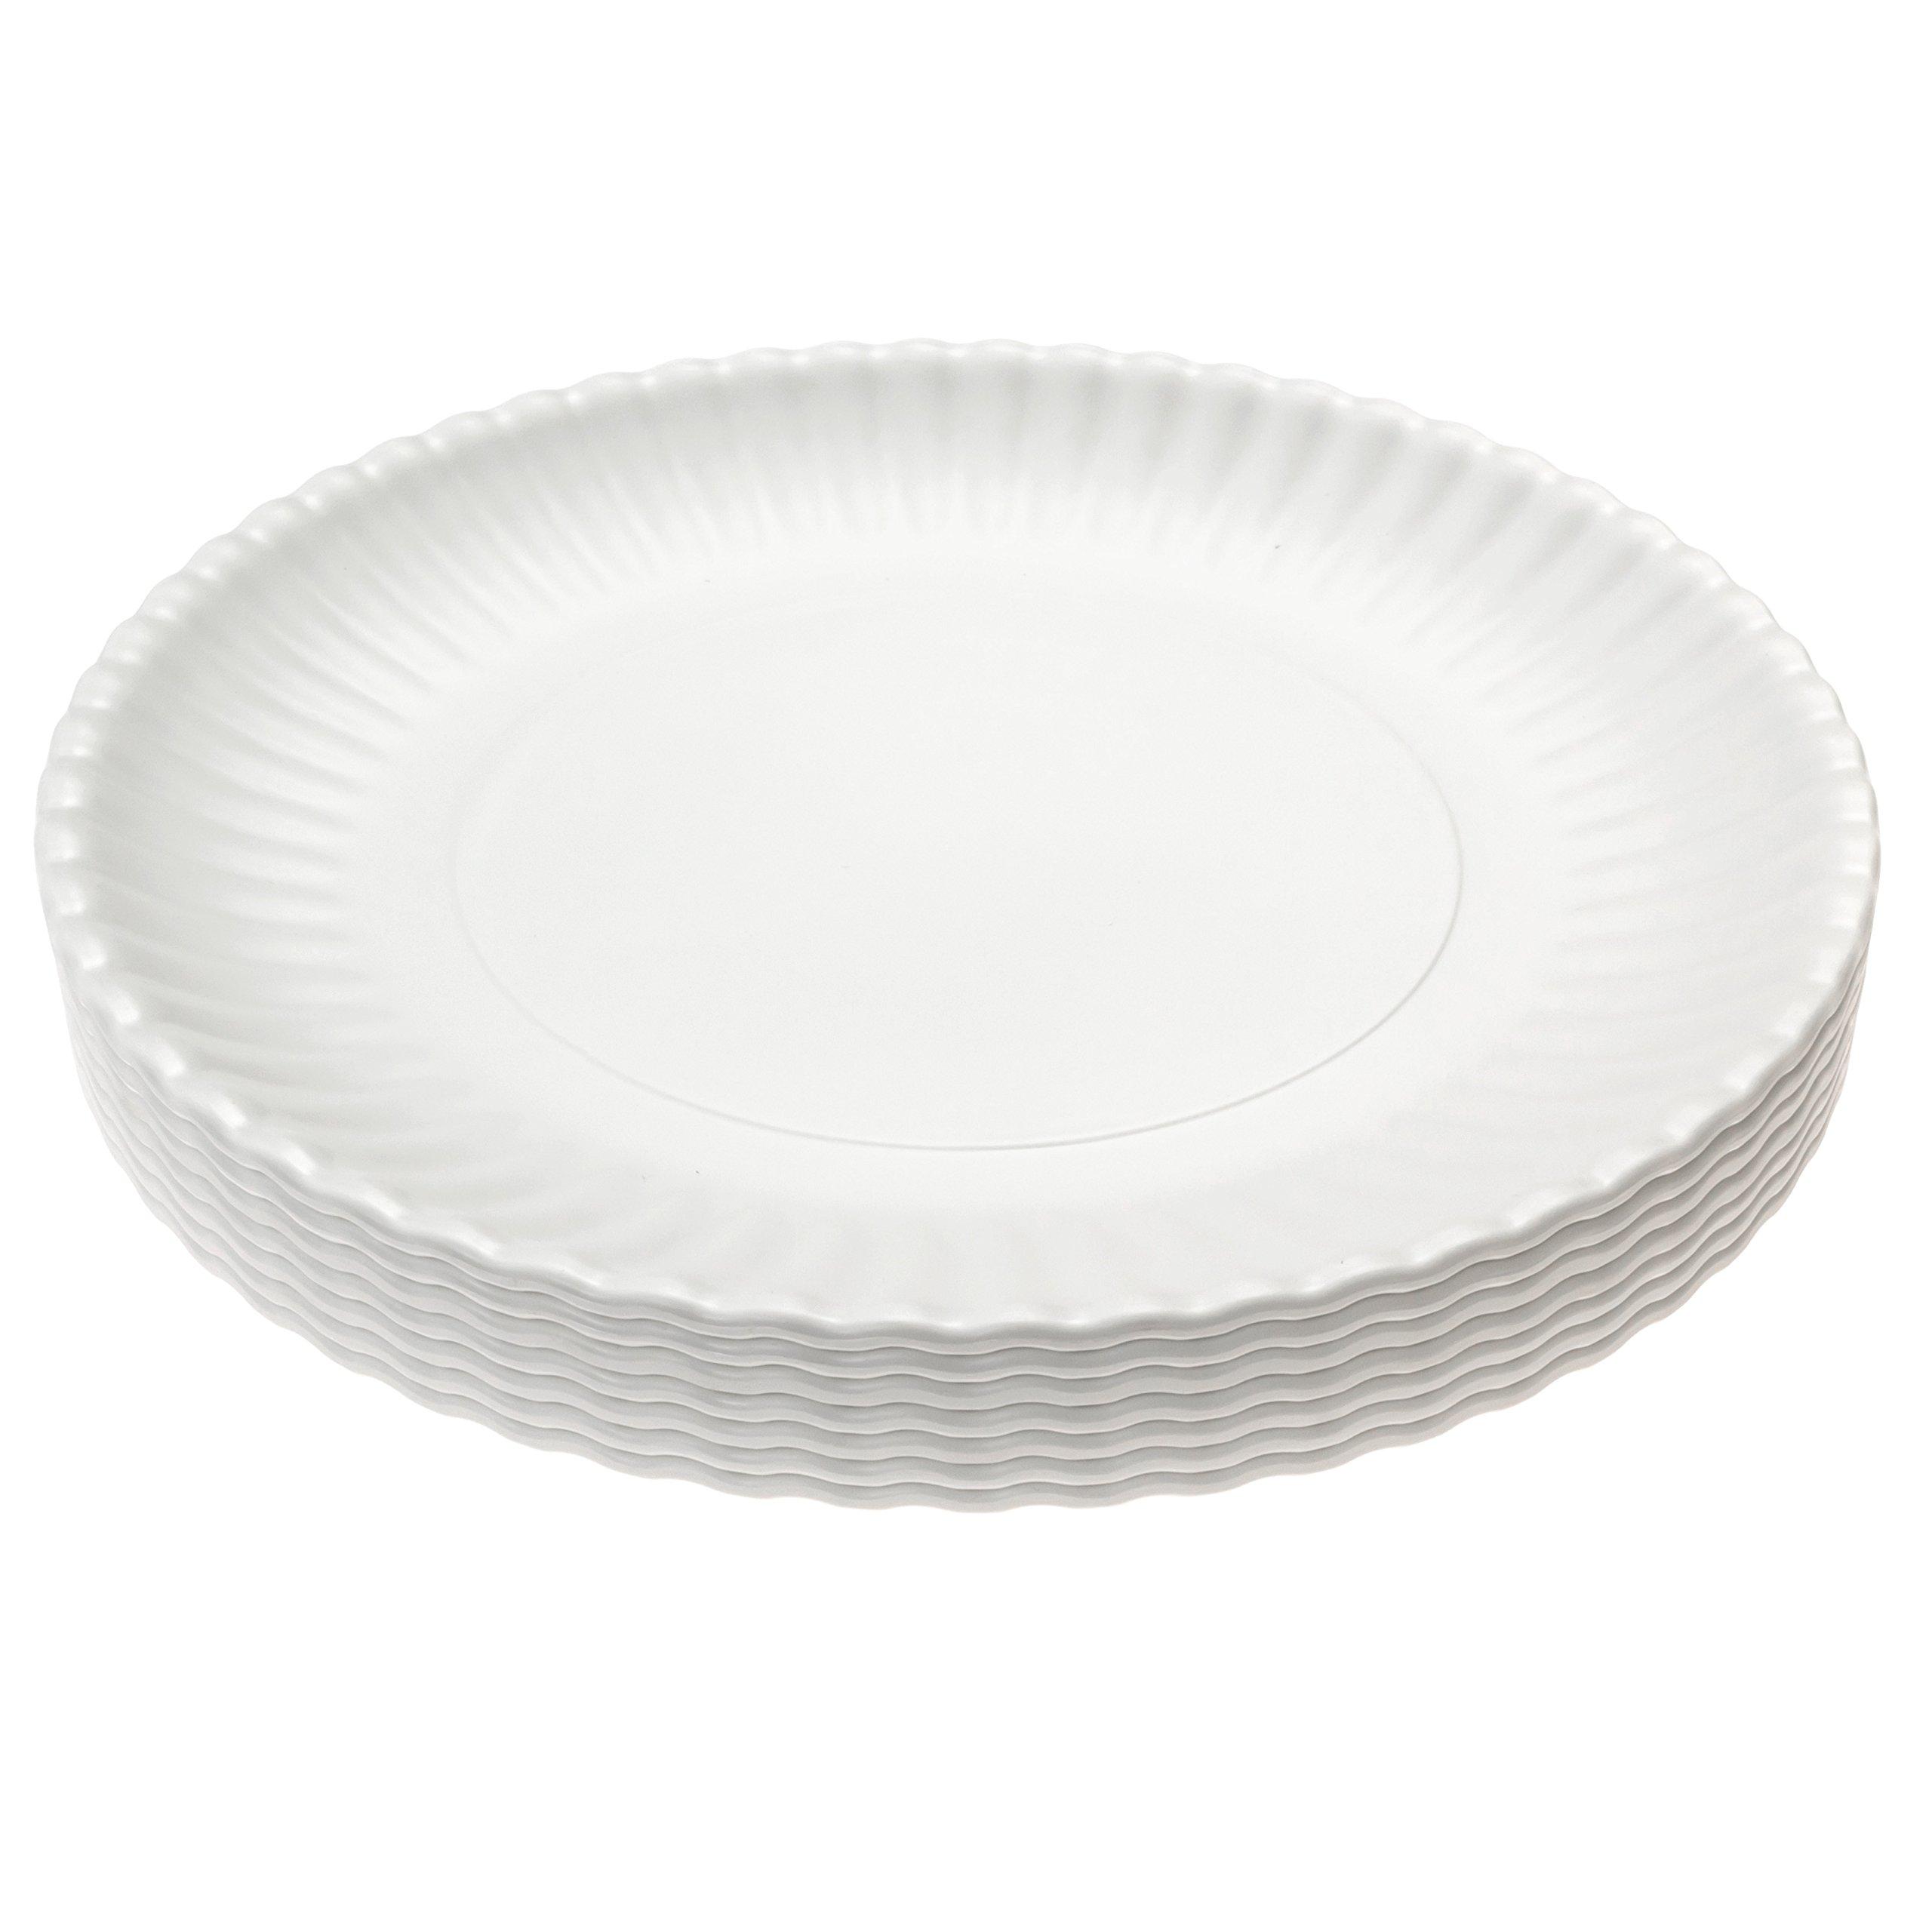 Picnique Reusable Paper Plate - Large 11'' Picnic & Dinner Melamine Plates, Dishwasher Safe, BPA Free - Set of 6 Plates